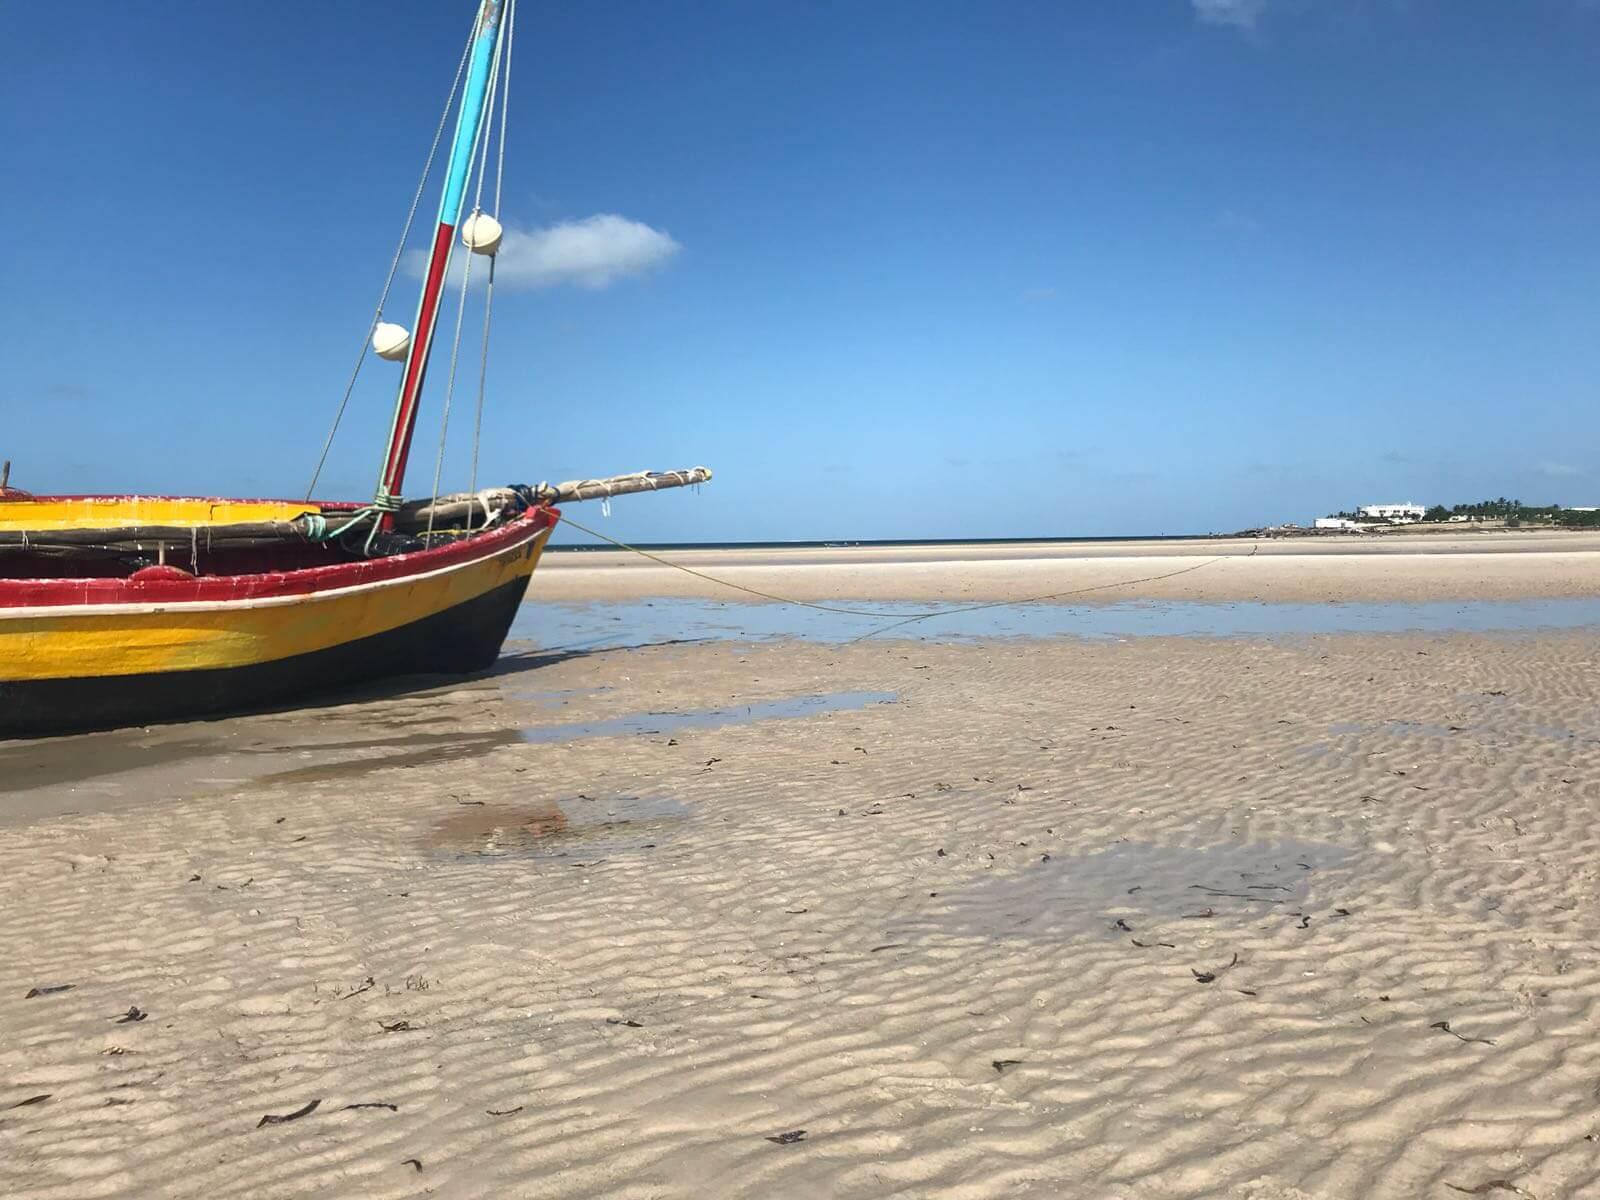 barco em praia de moçambique